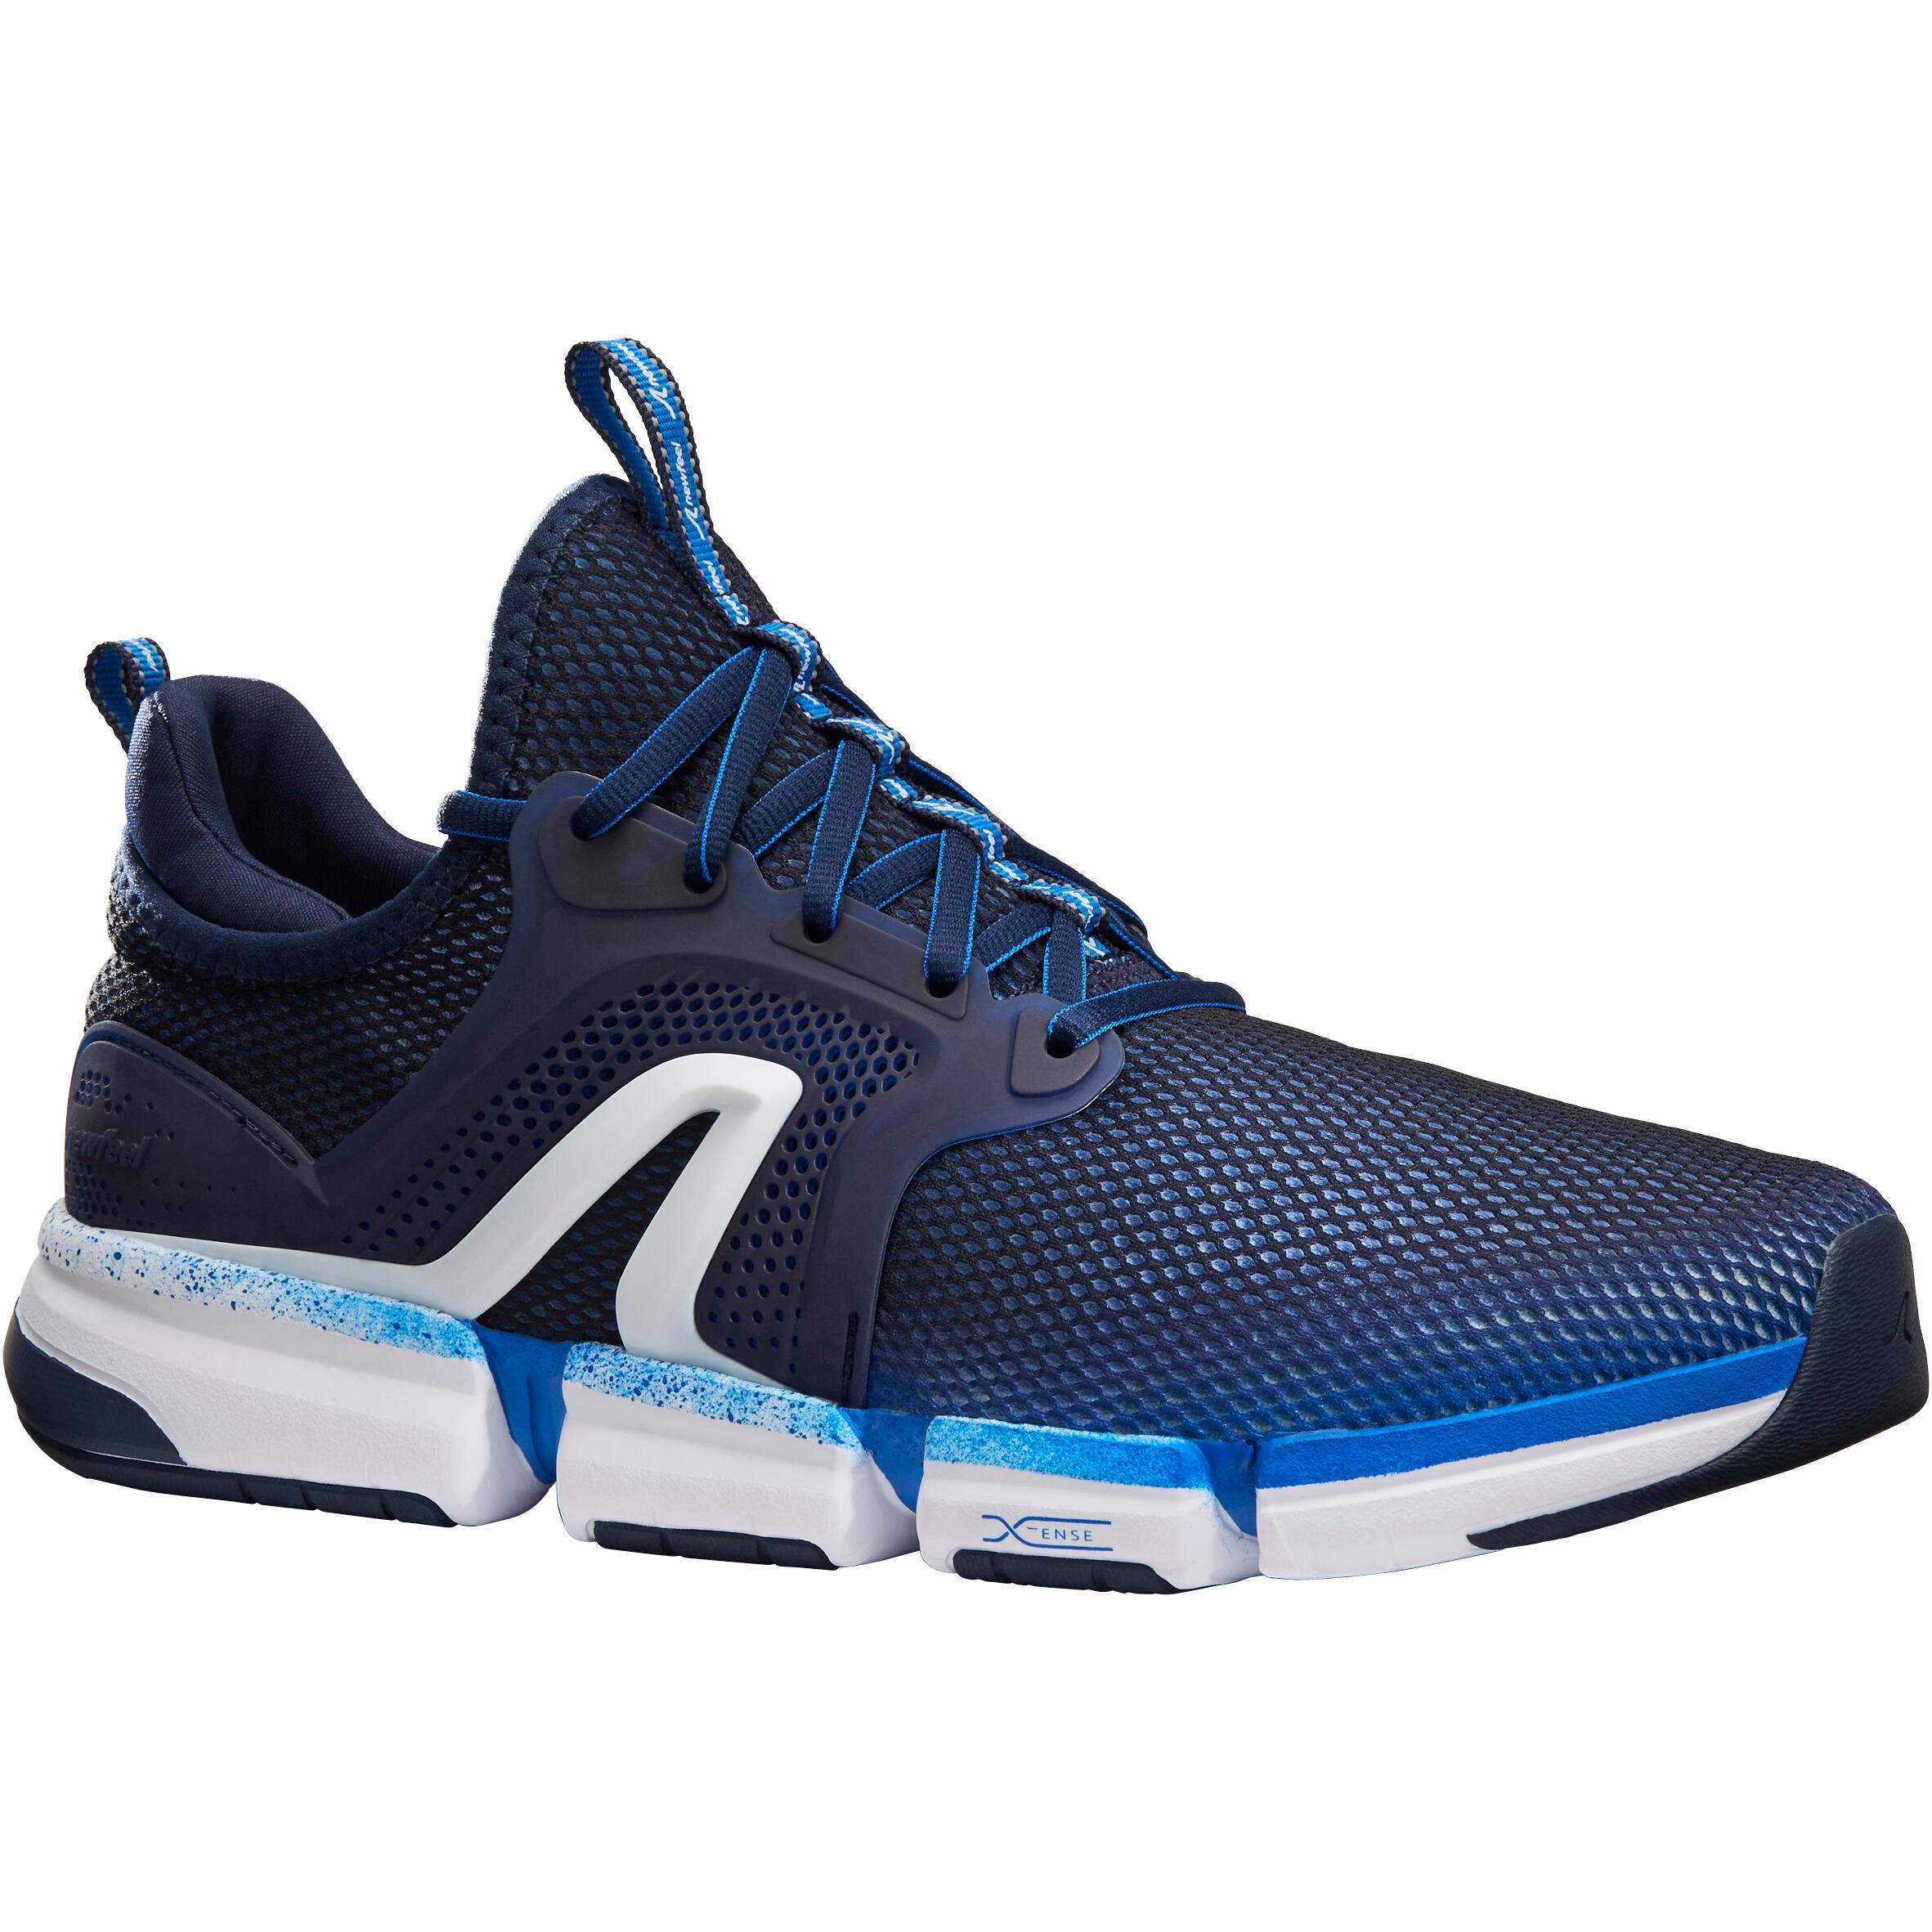 Newfeel Chaussures marche sportive homme PW 590 Xtense marine - Newfeel